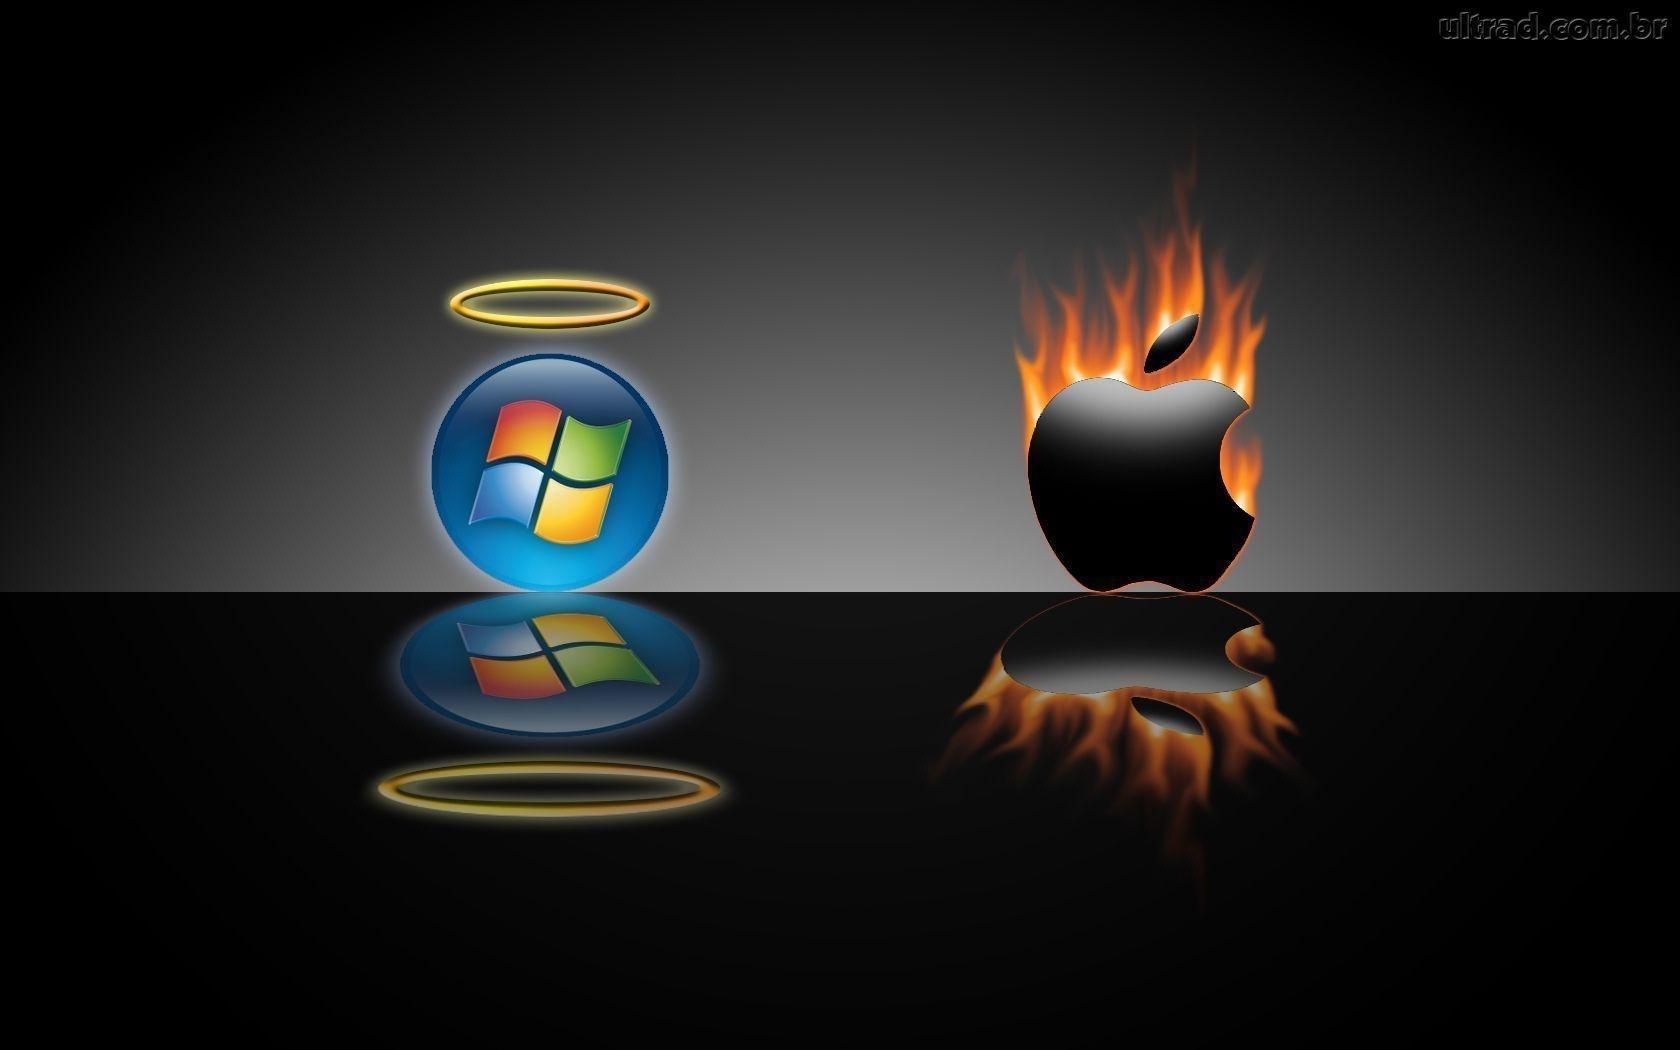 windows vs mac wallpapers - wallpaper cave